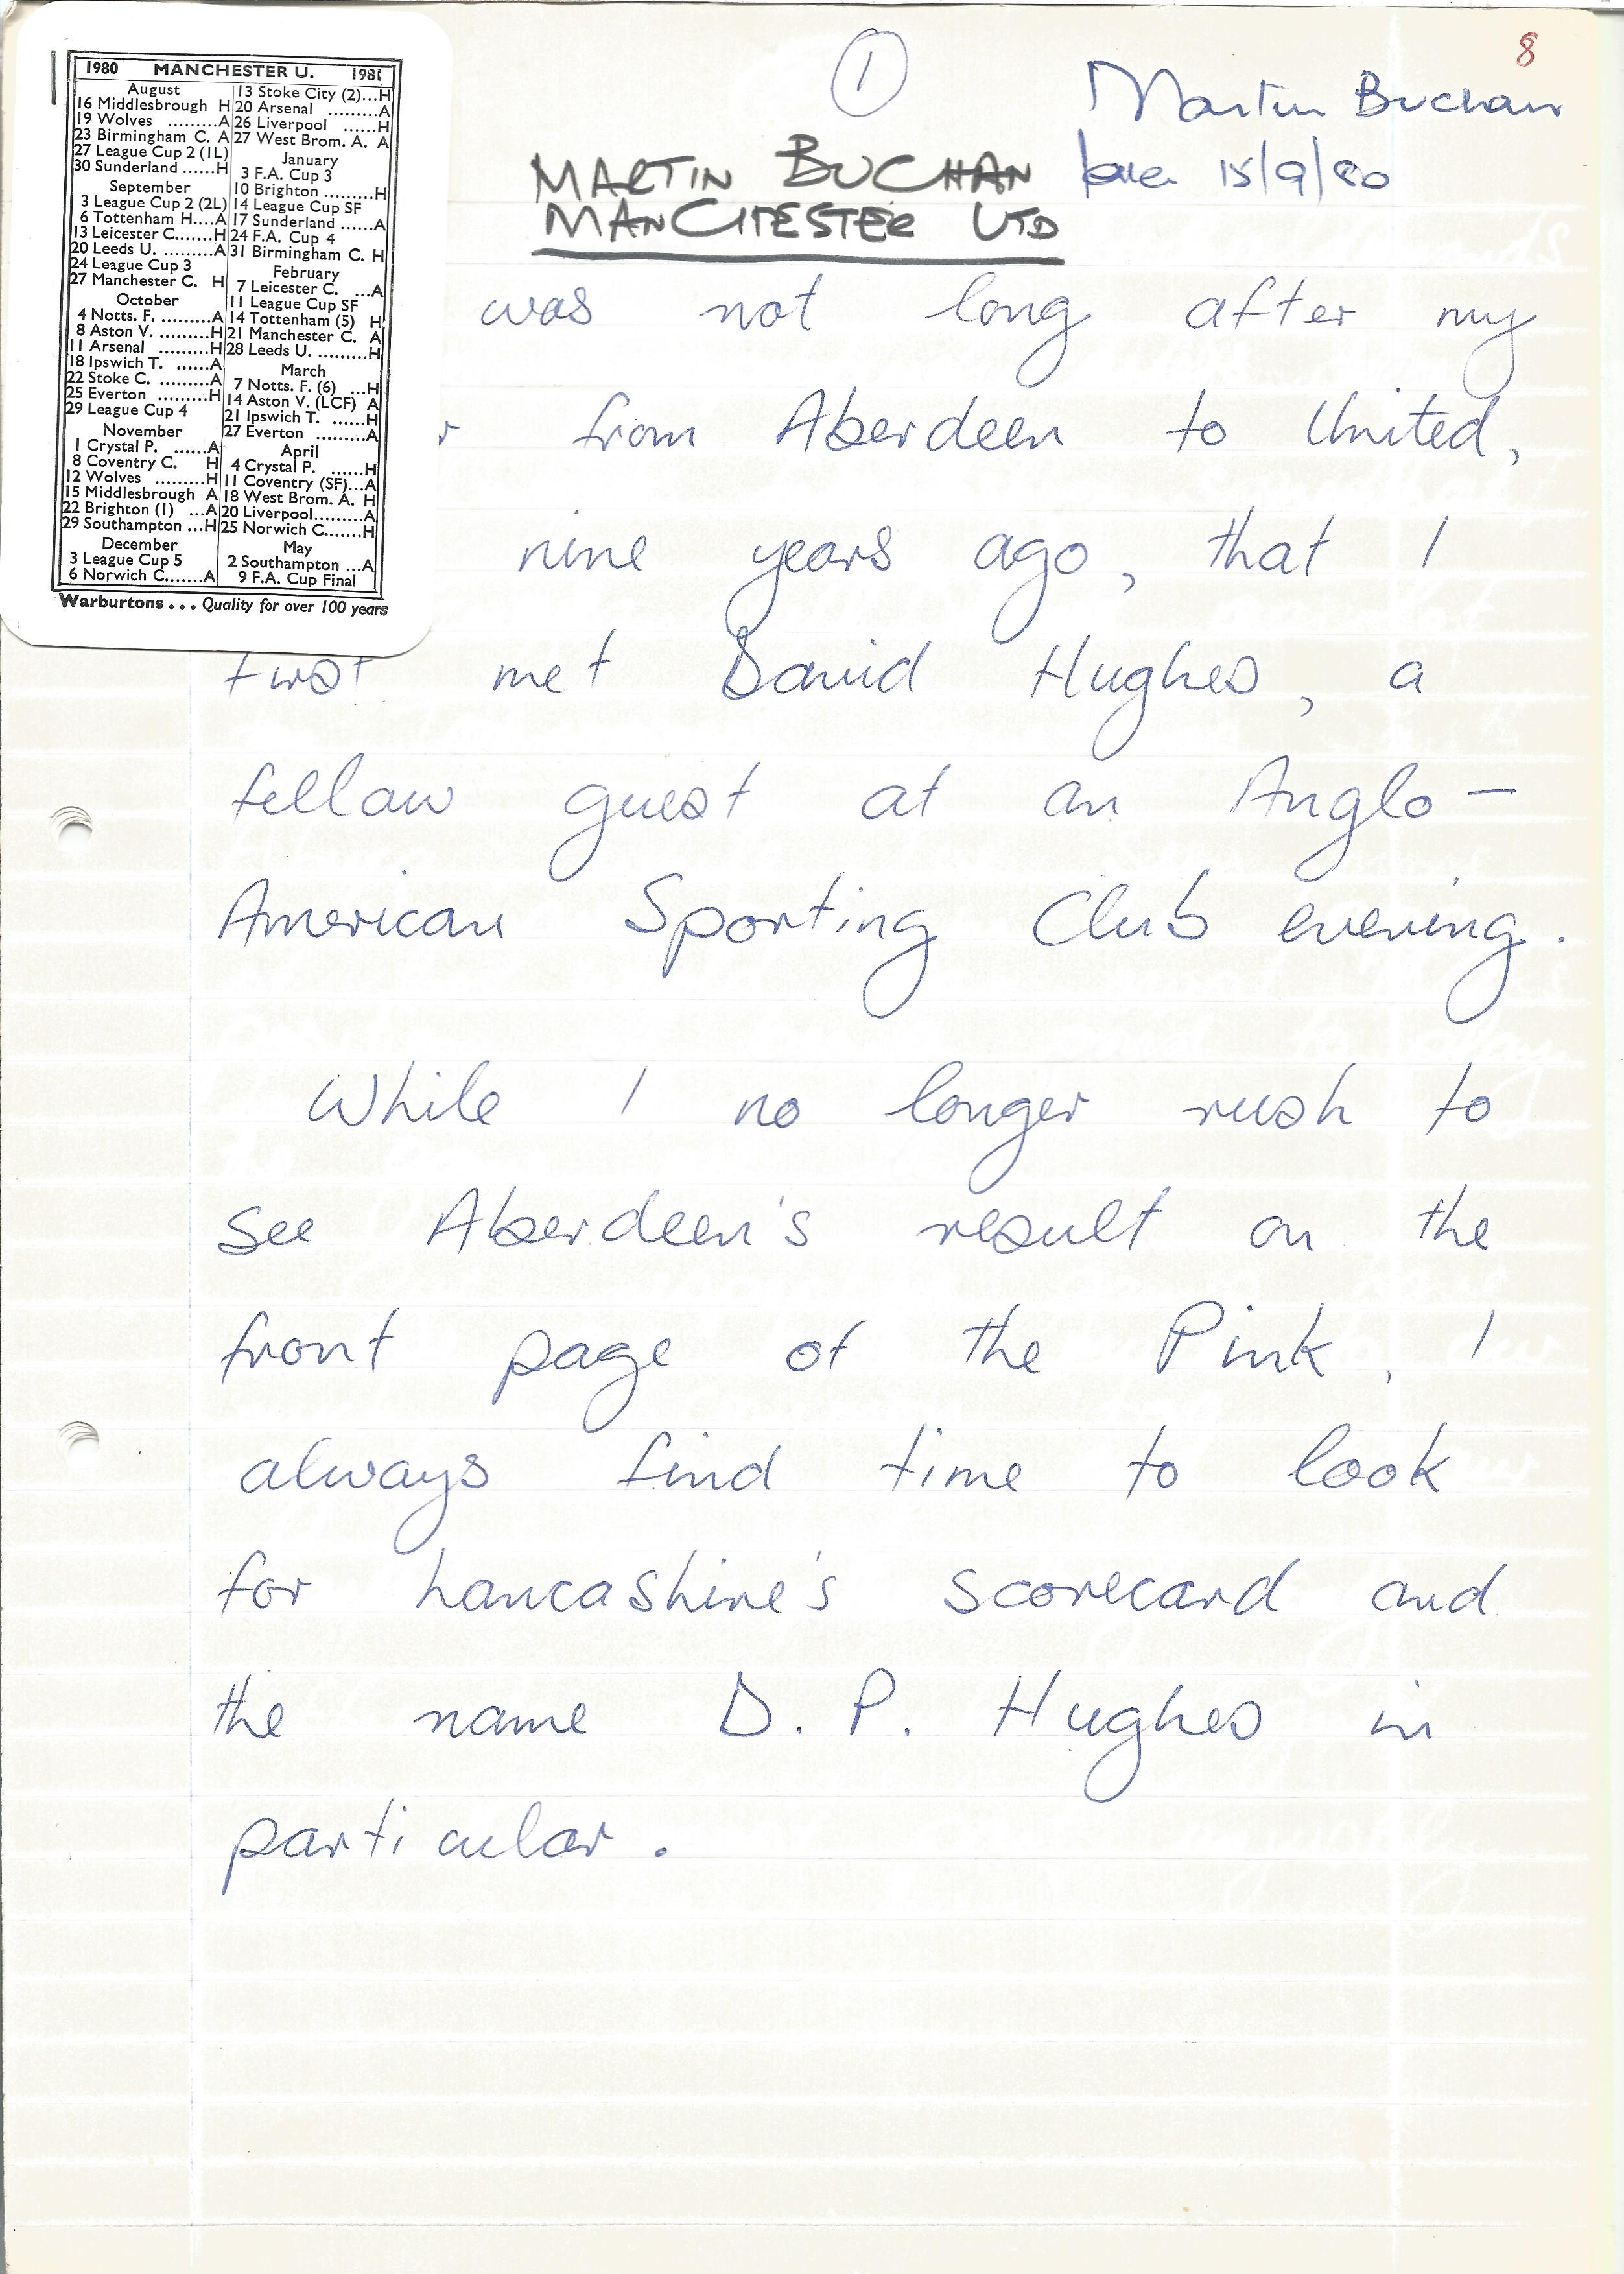 Footballer Martin Buchan, 7-page handwritten article for the testimonial brochure of Lancashire